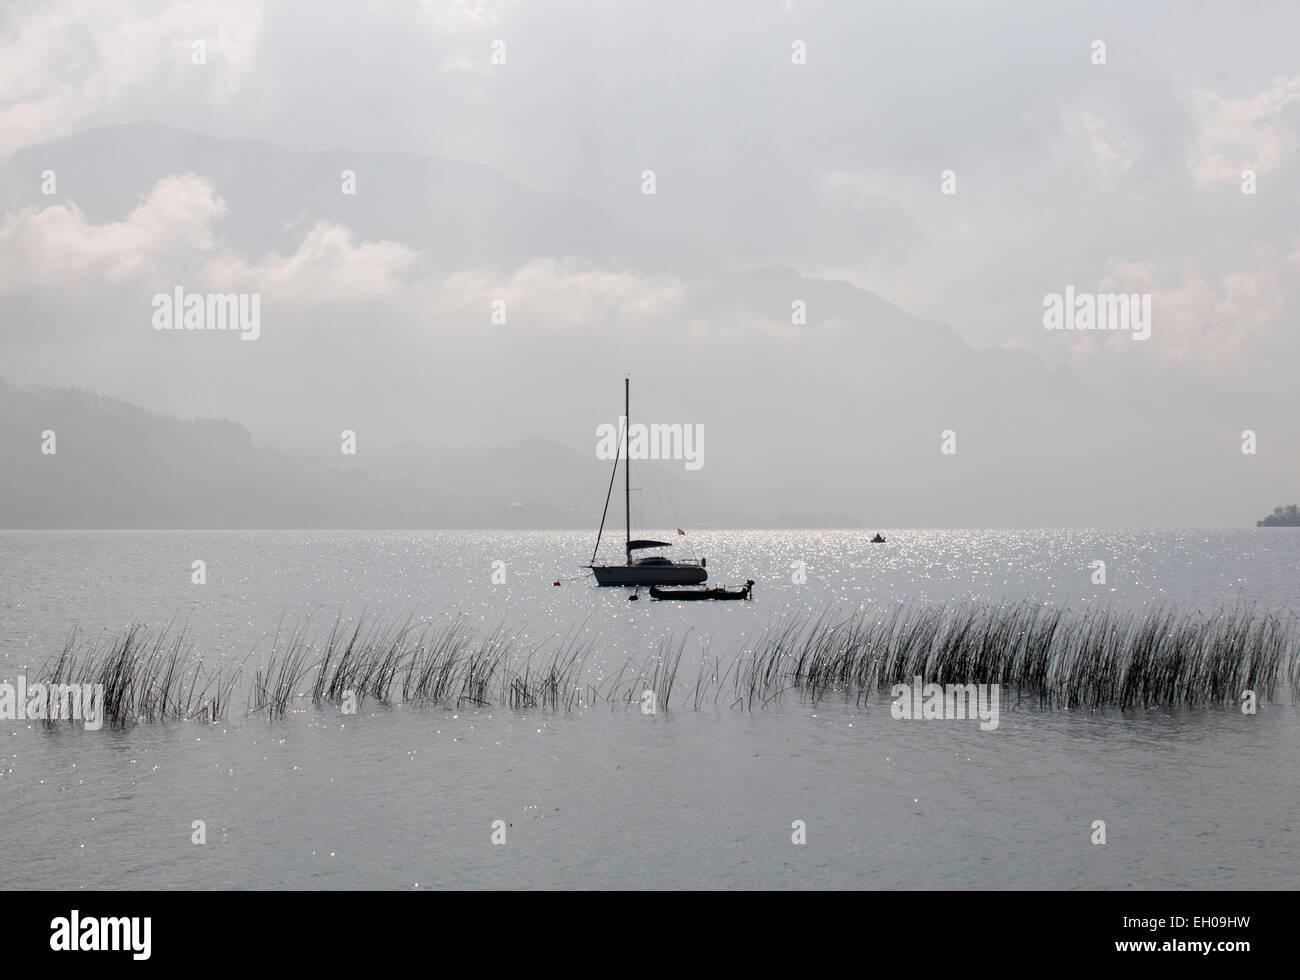 Austria, Nussdorf, tormentosa atmósfera en el lago Atterssee Imagen De Stock